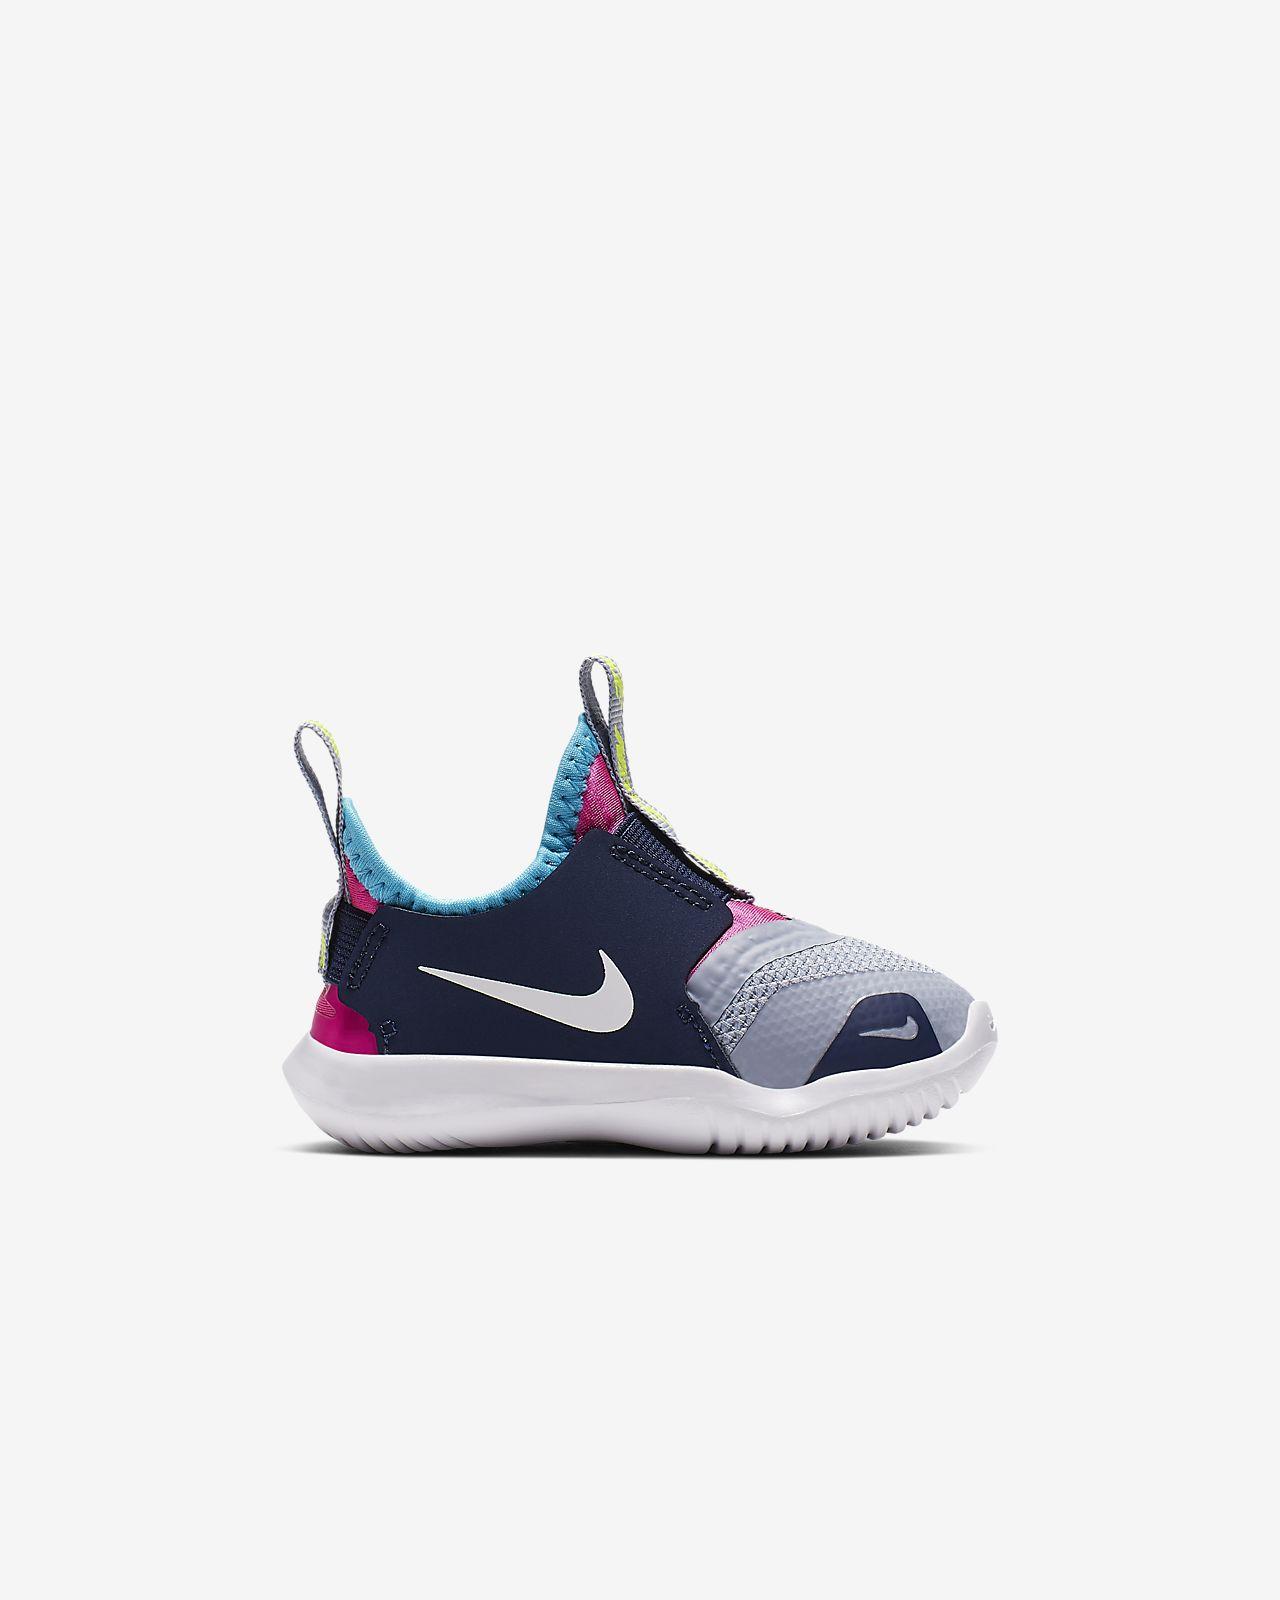 Nike Flex Runner Baby \u0026amp; Toddler